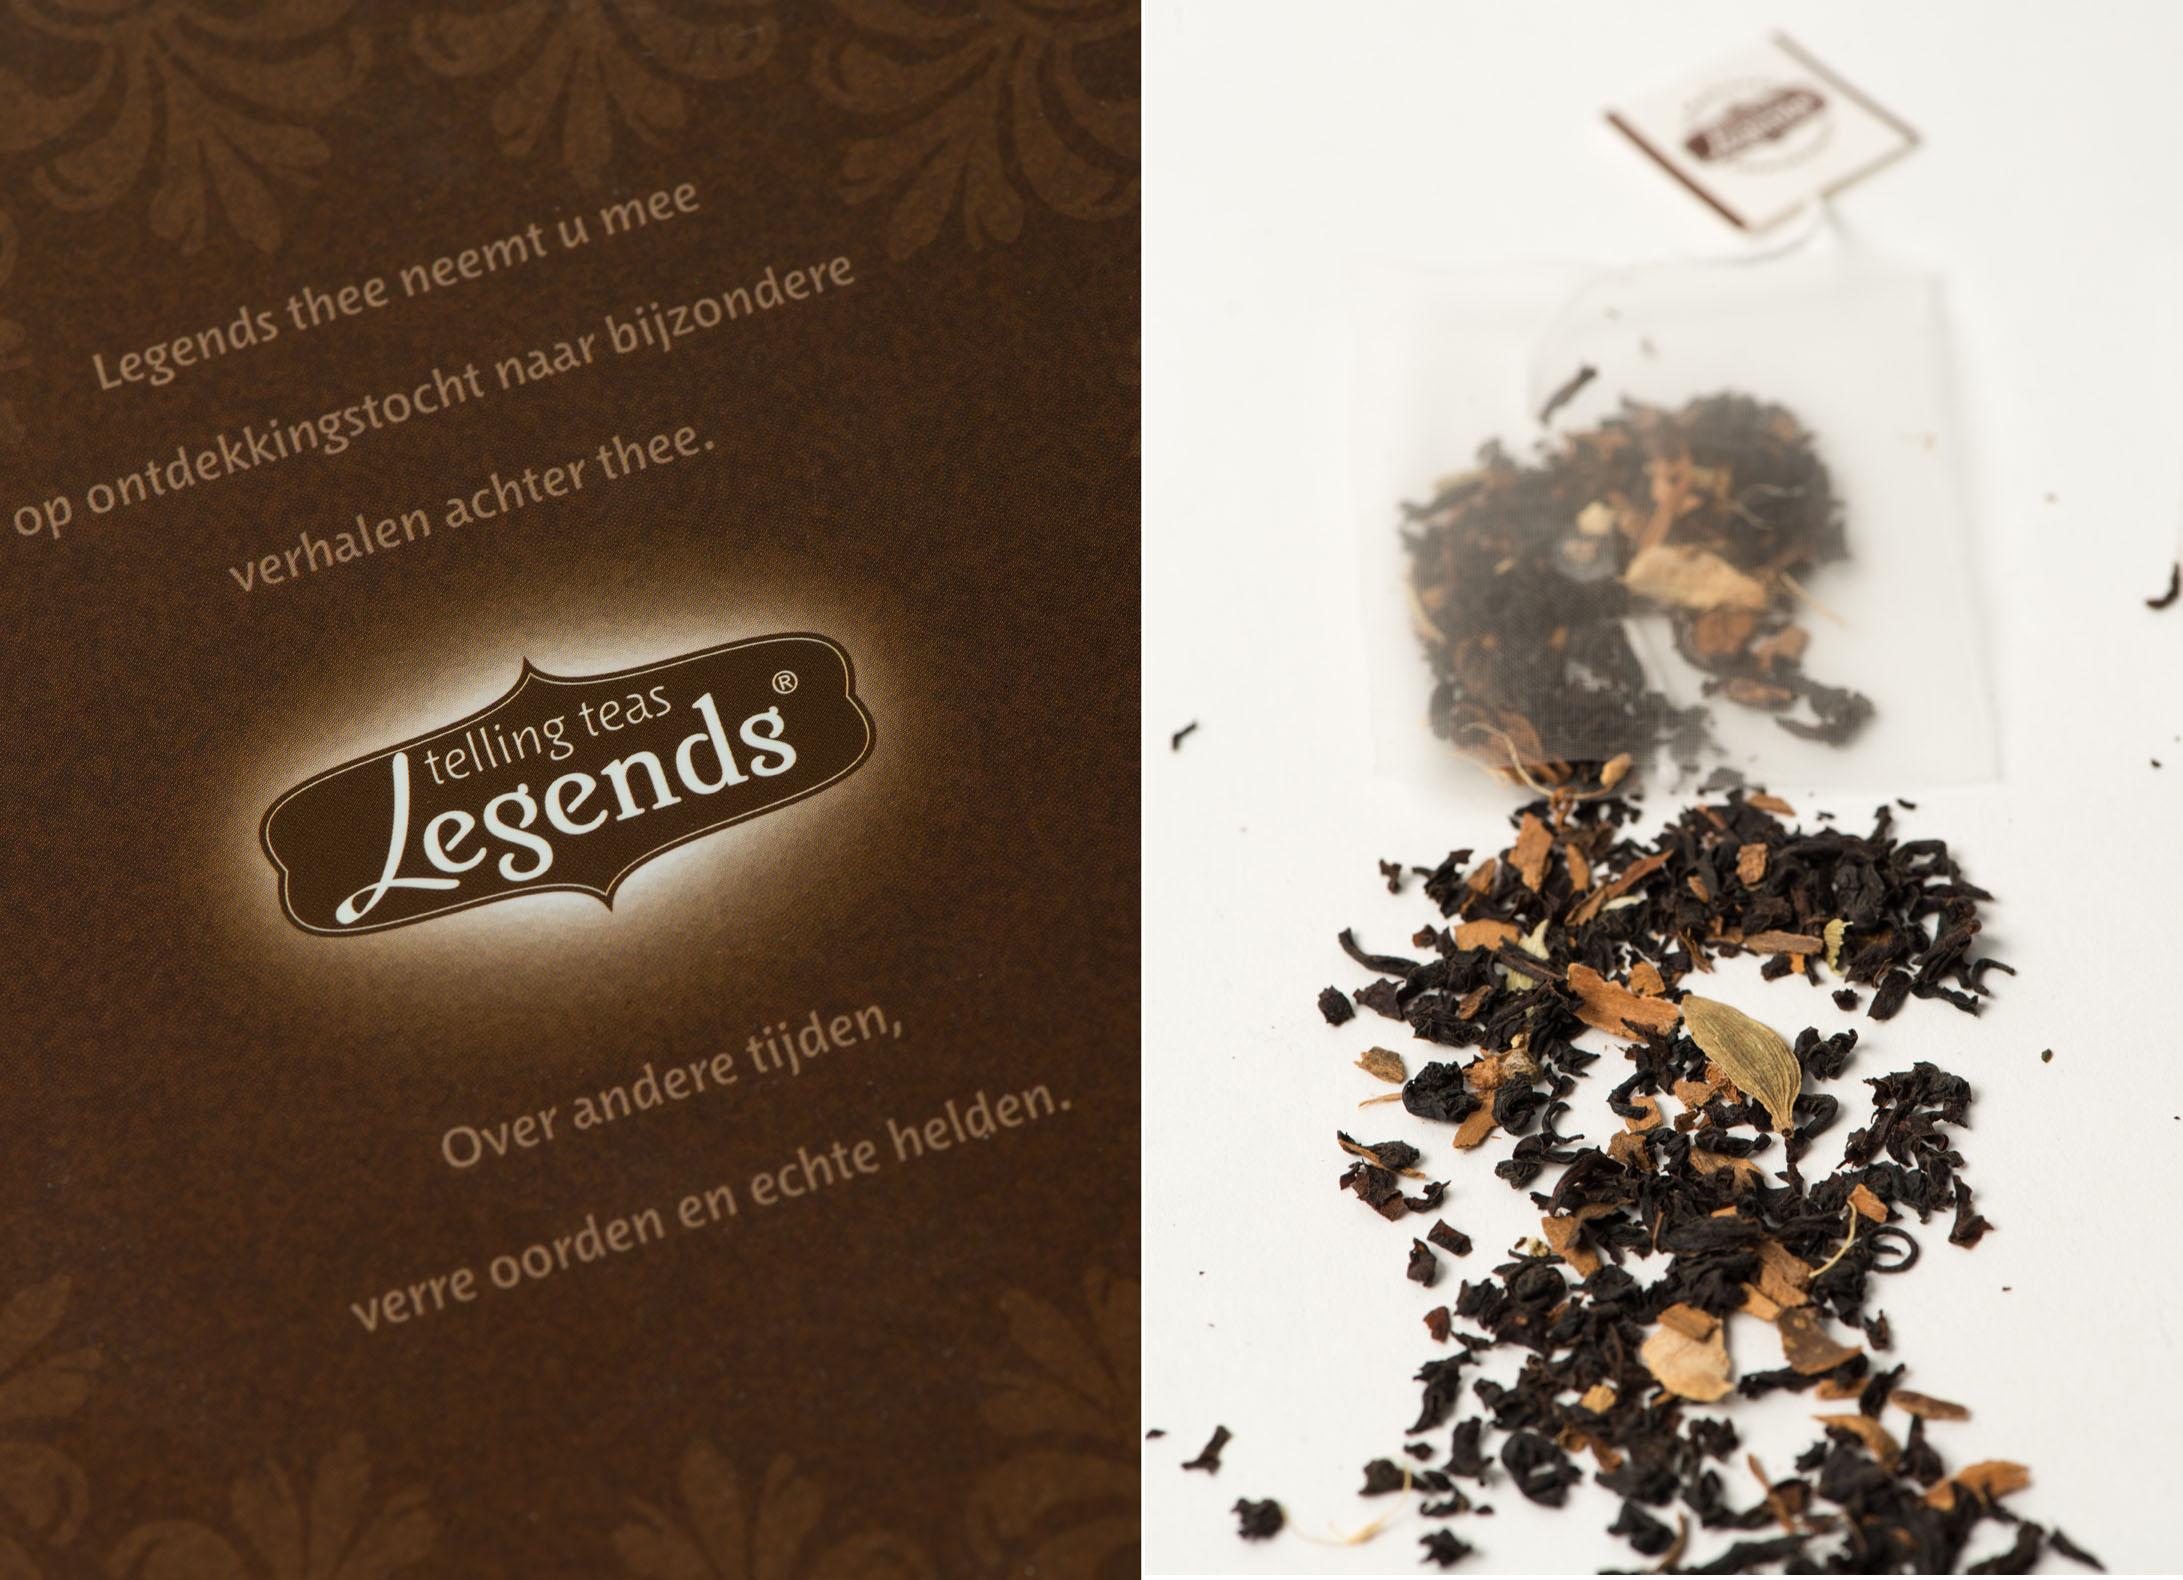 Legends Telling teas detail